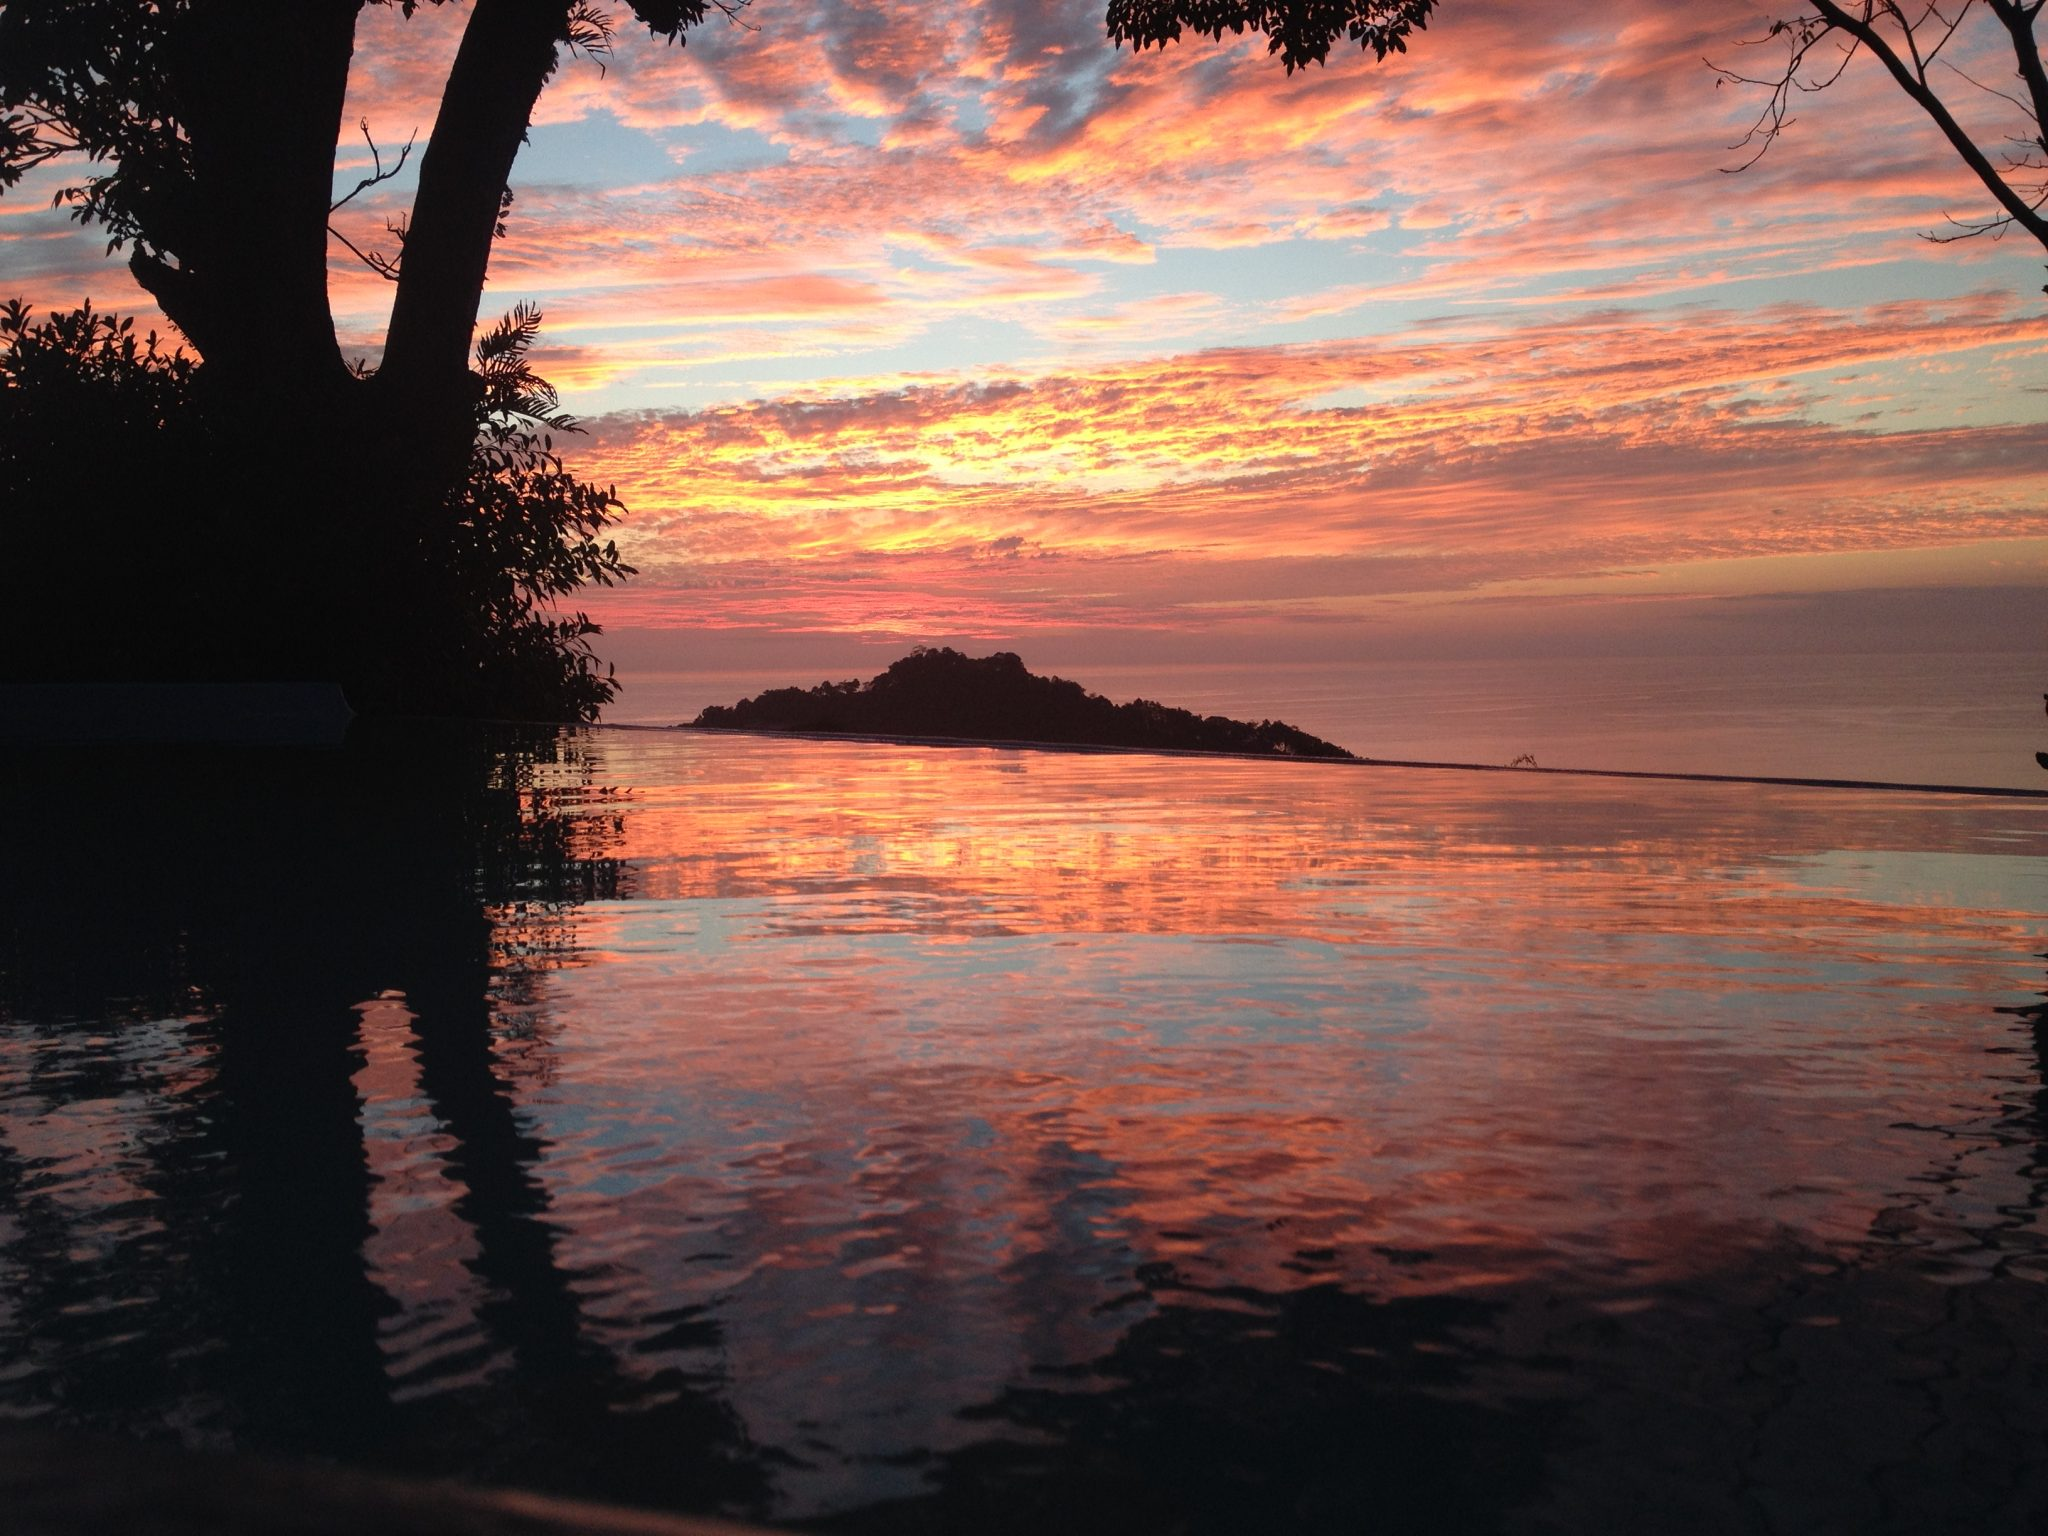 hotels-near-the-pacific-ocean-in-costa-rica